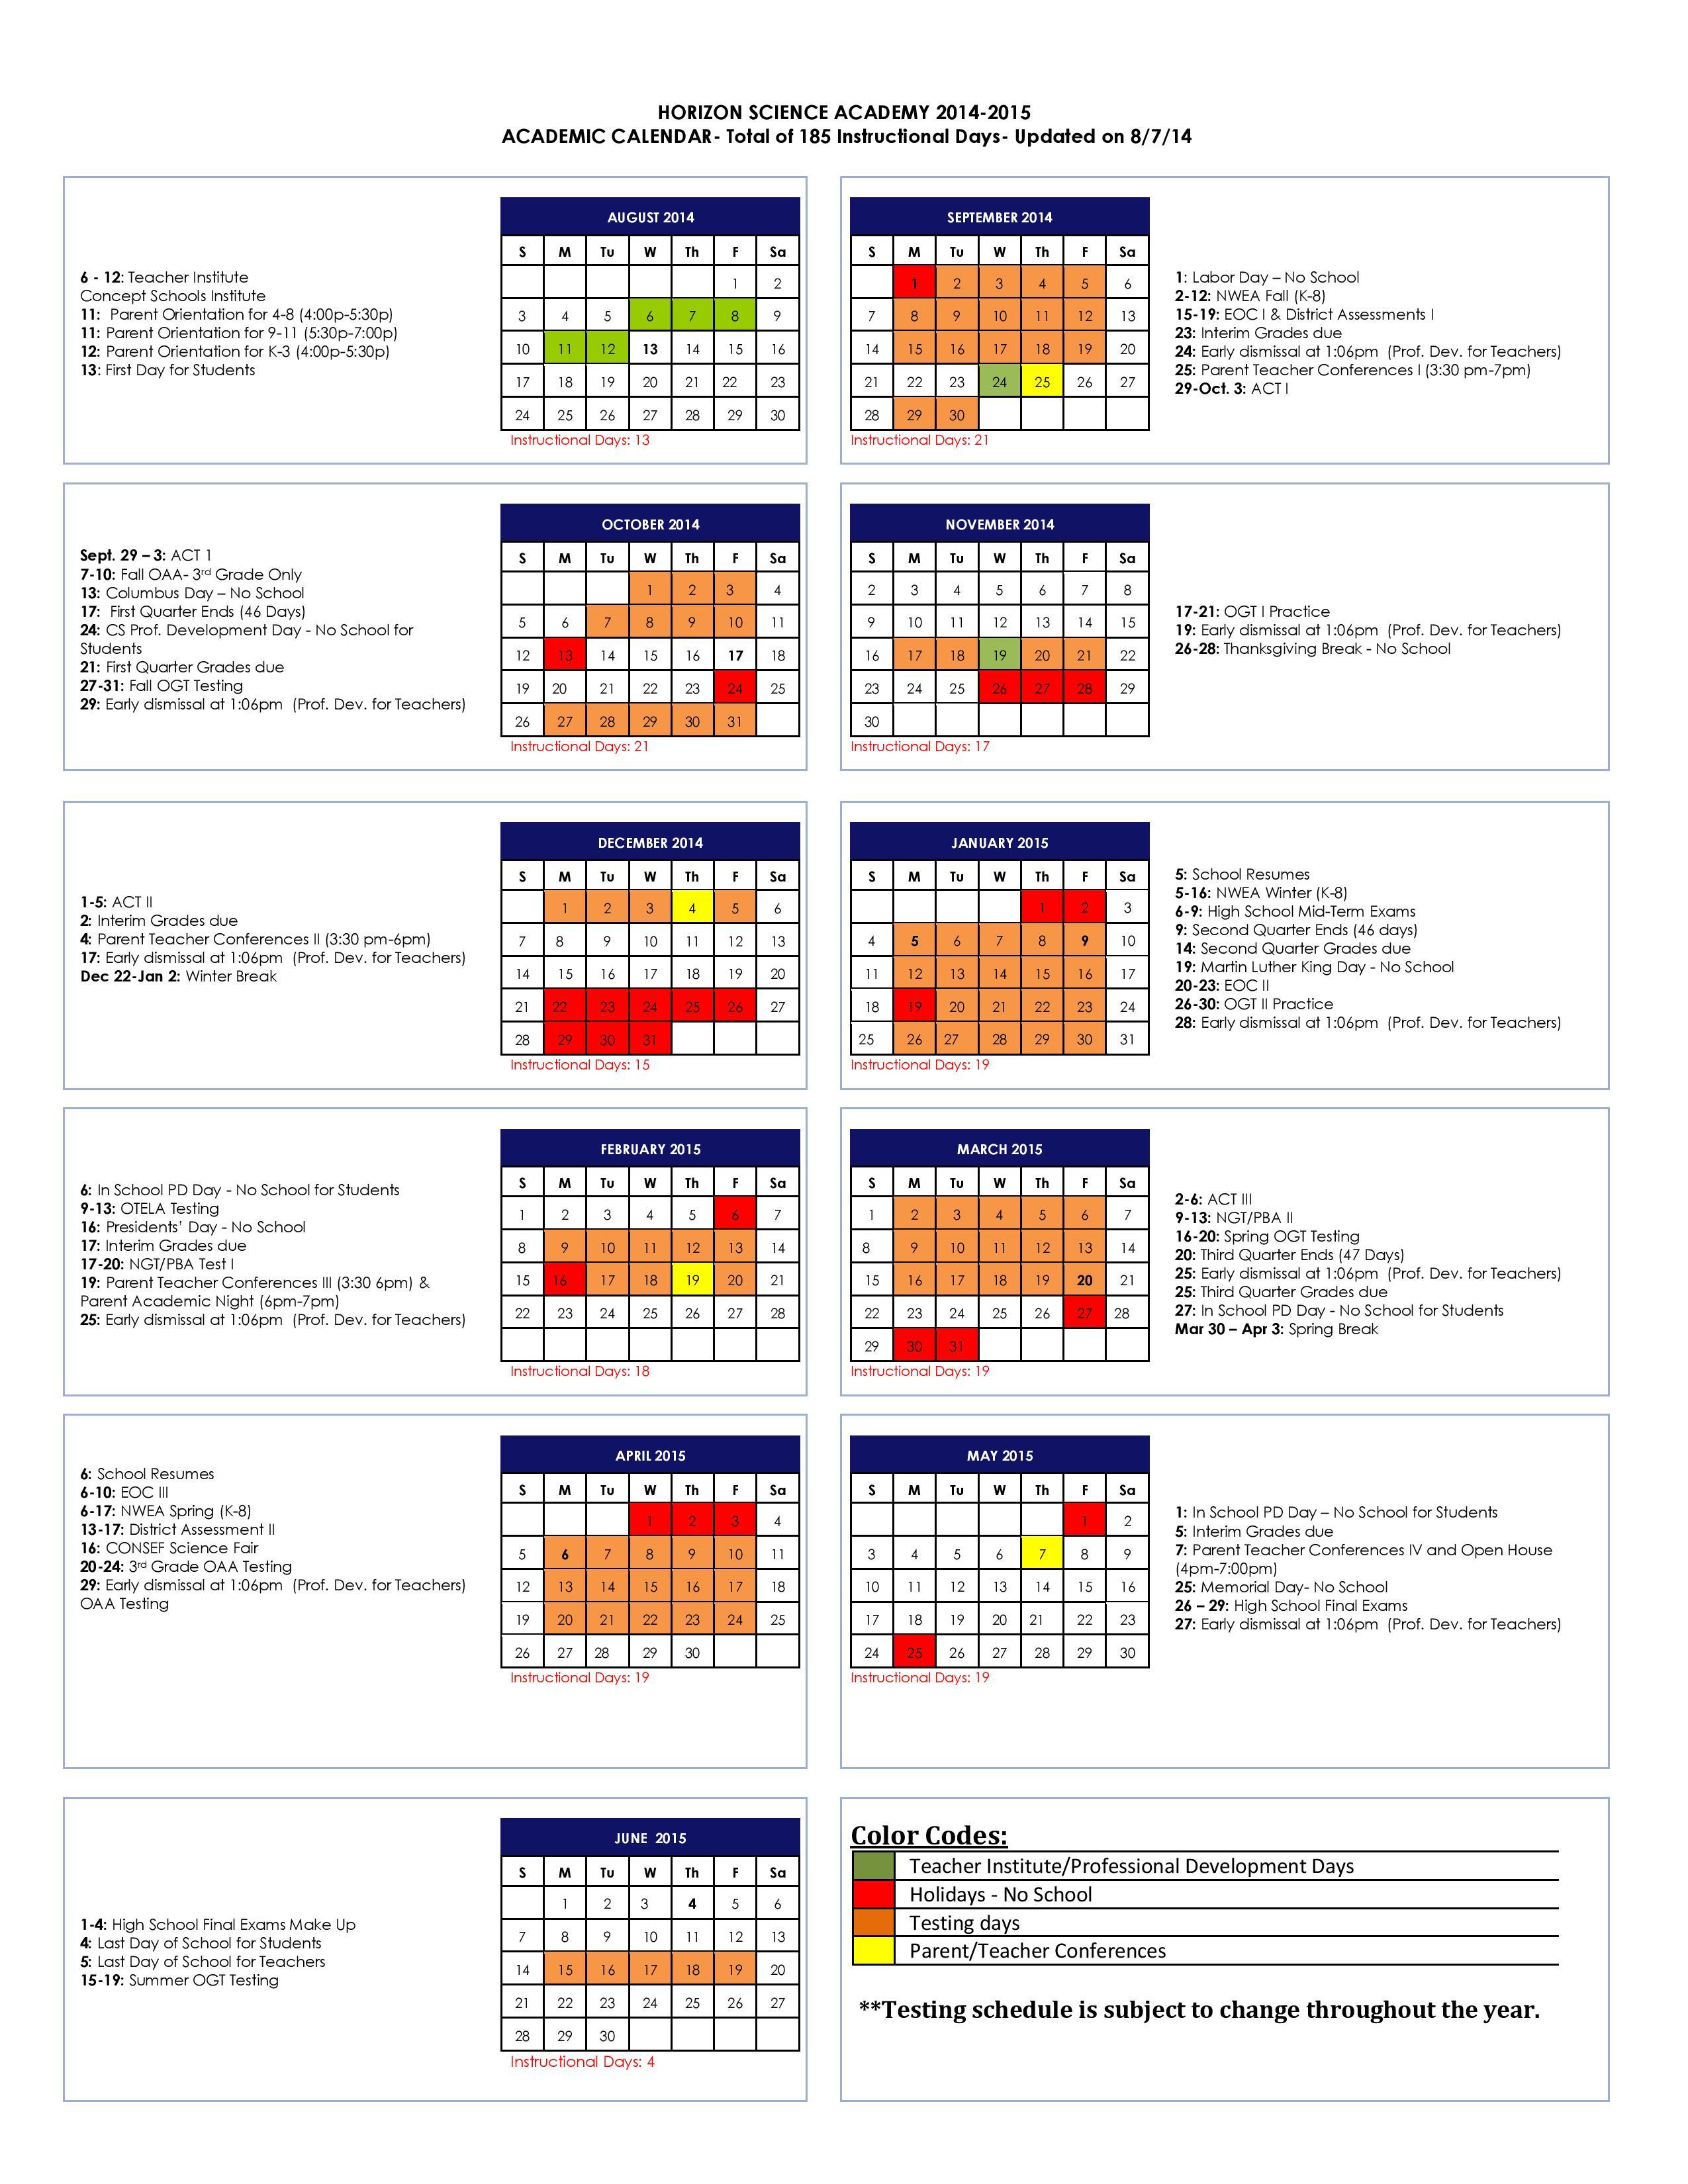 Calendars – Hsa Lorain Charter School (K 12)Concept Schools With Regard To Case Western Reserve University Academic Calendar